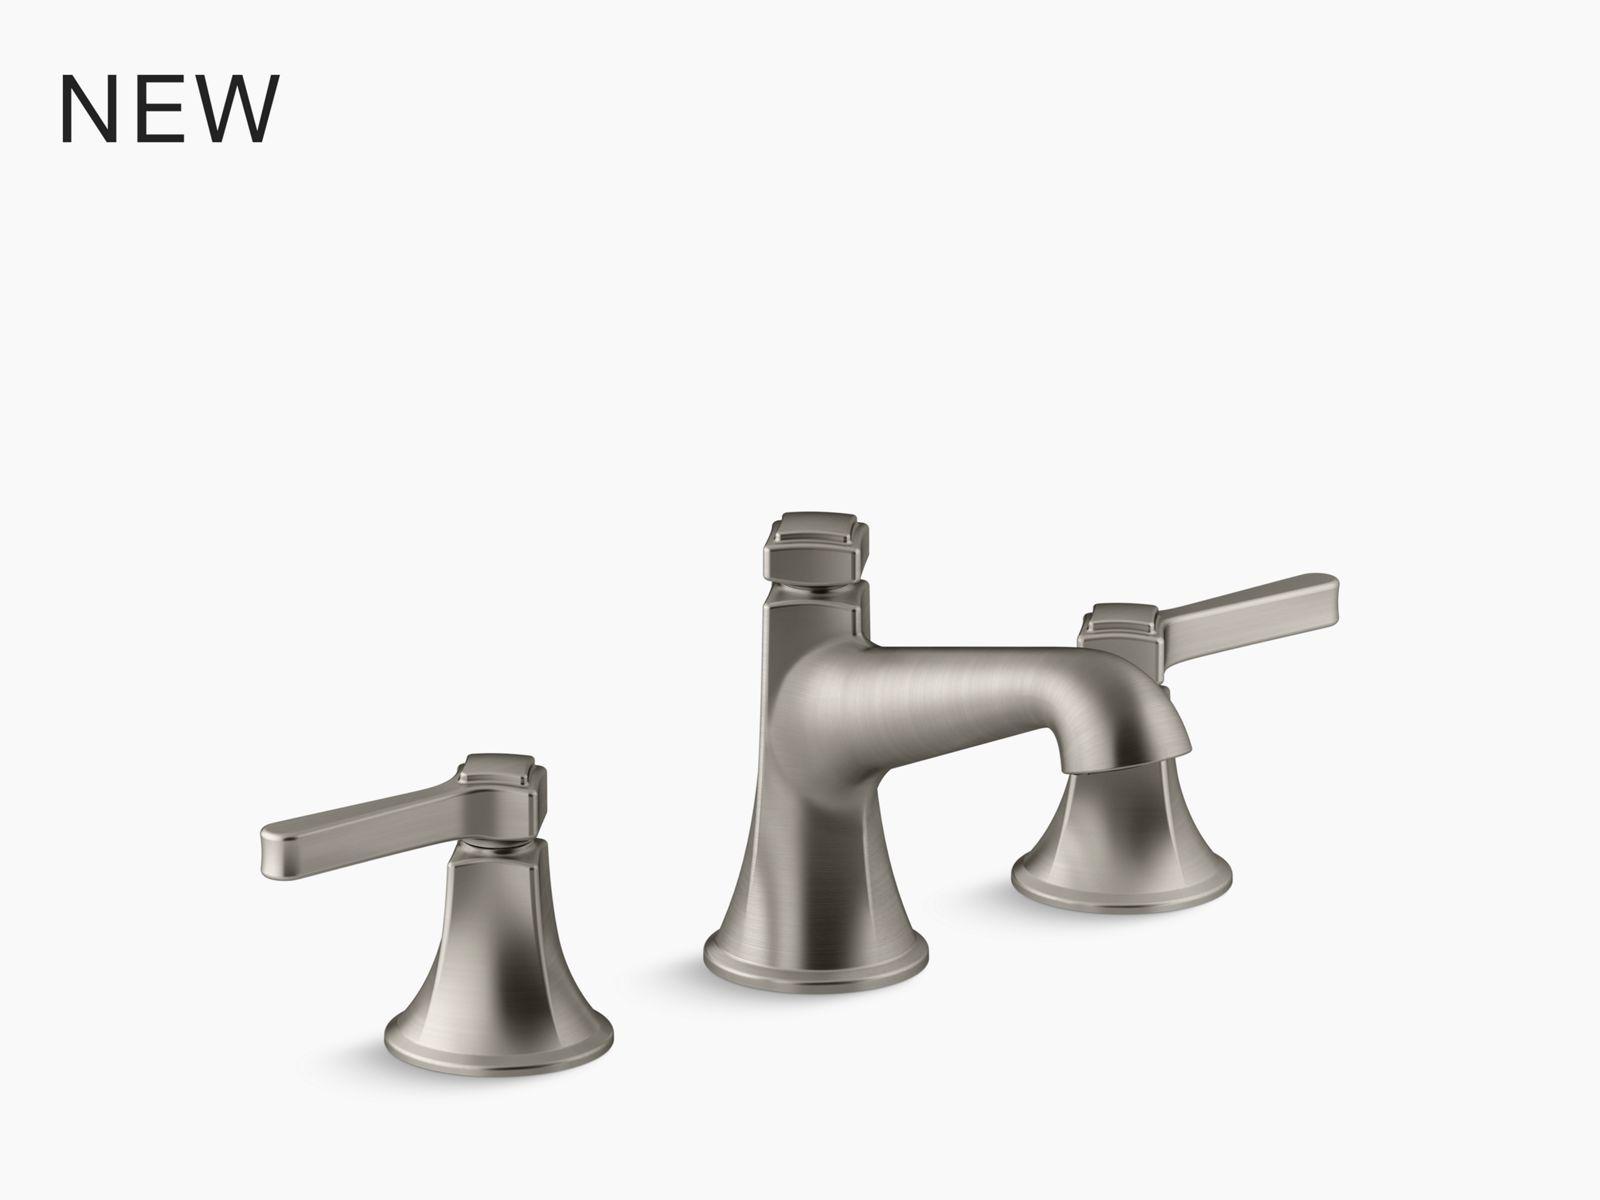 purist wall mount sink faucet trim